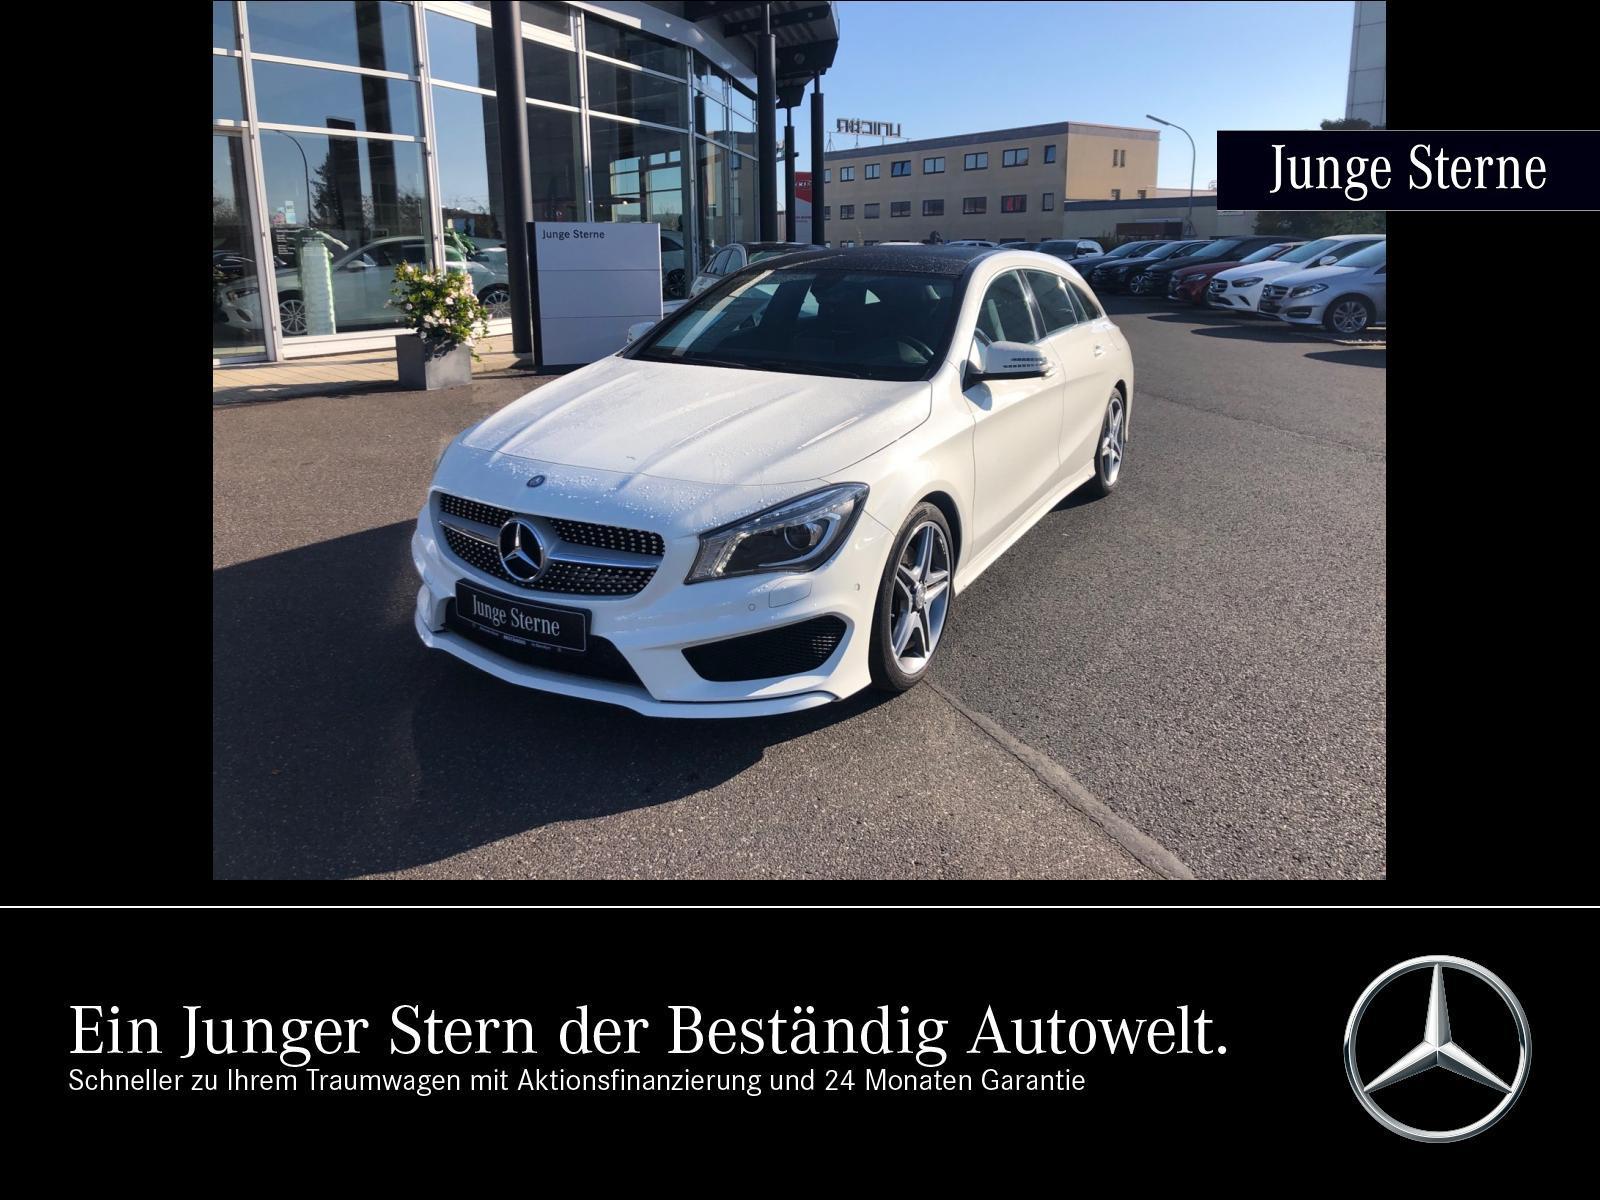 Mercedes-Benz CLA 250 Shooting Brake AMG Line 4M +PANO+XENON, Jahr 2015, Benzin